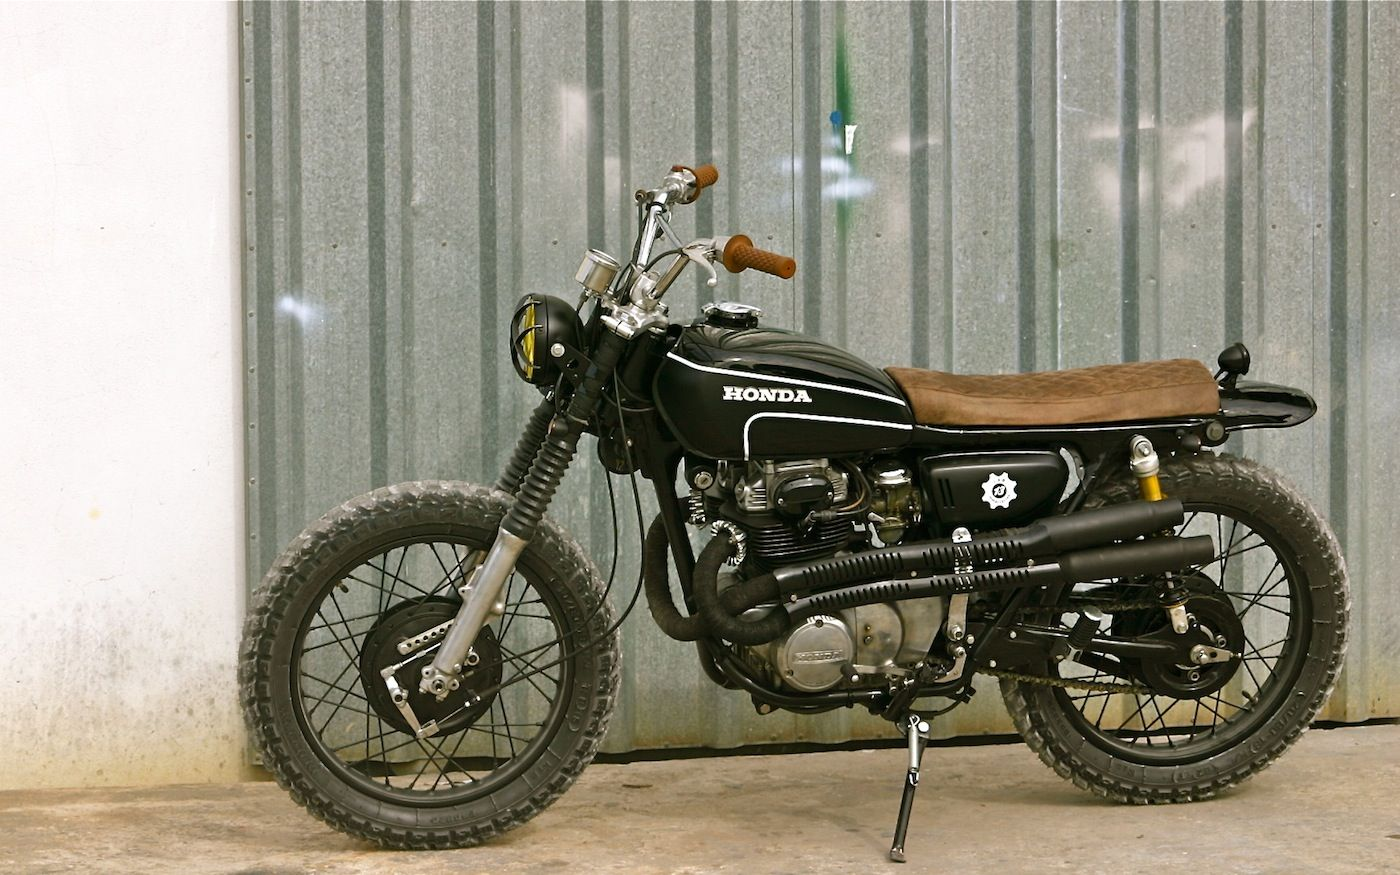 Cl360 Lab 13 Inazuma Cafe Racer Scrambler Enduro Motorcycle Honda Scrambler [ 875 x 1400 Pixel ]